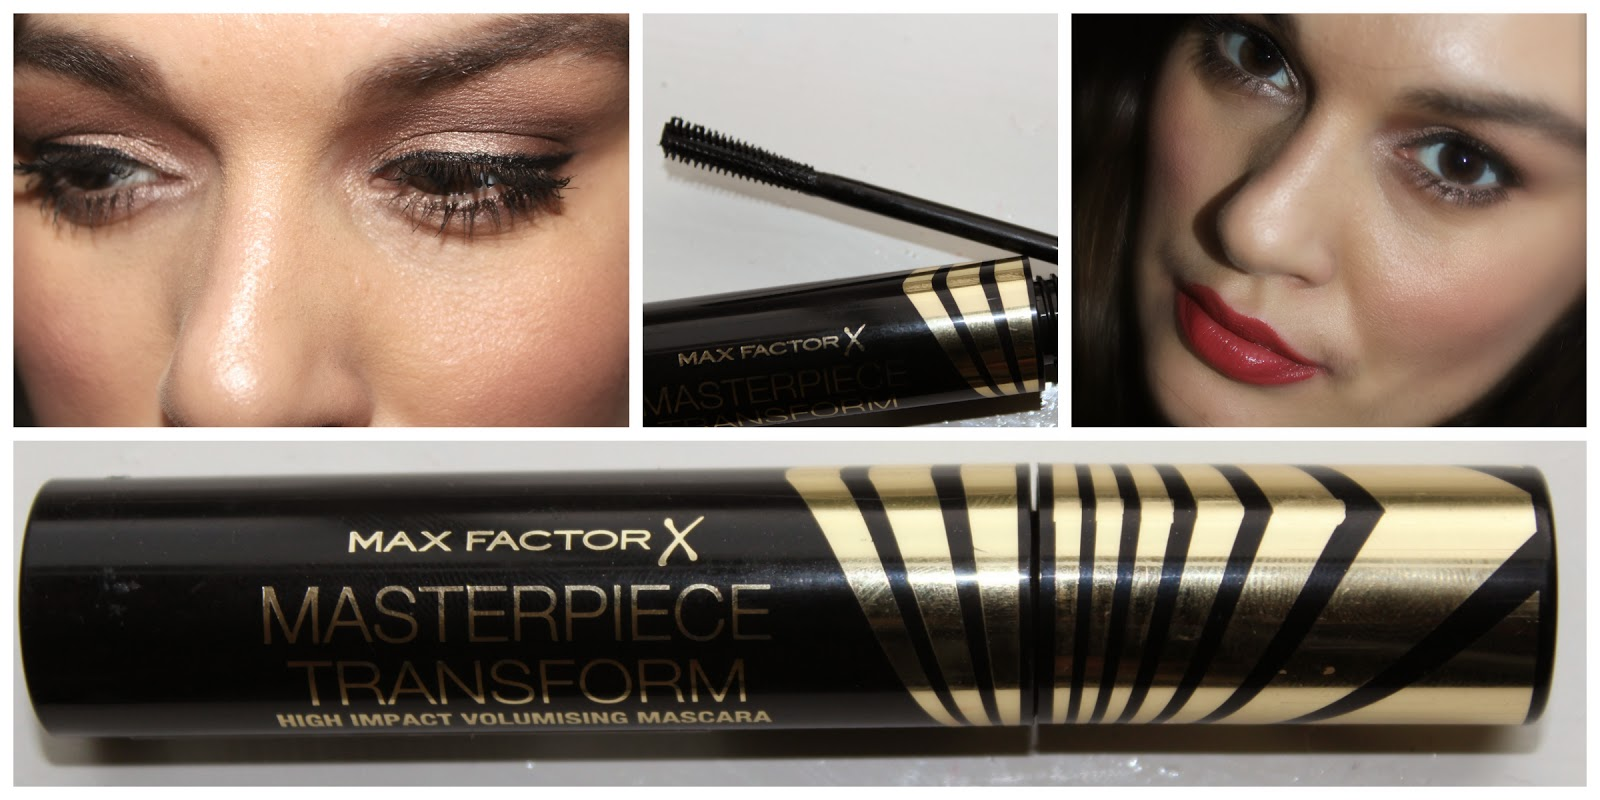 Beautiful Me Plus You Max Factor Masterpiece Transform High Impact Volumising Mascara Review